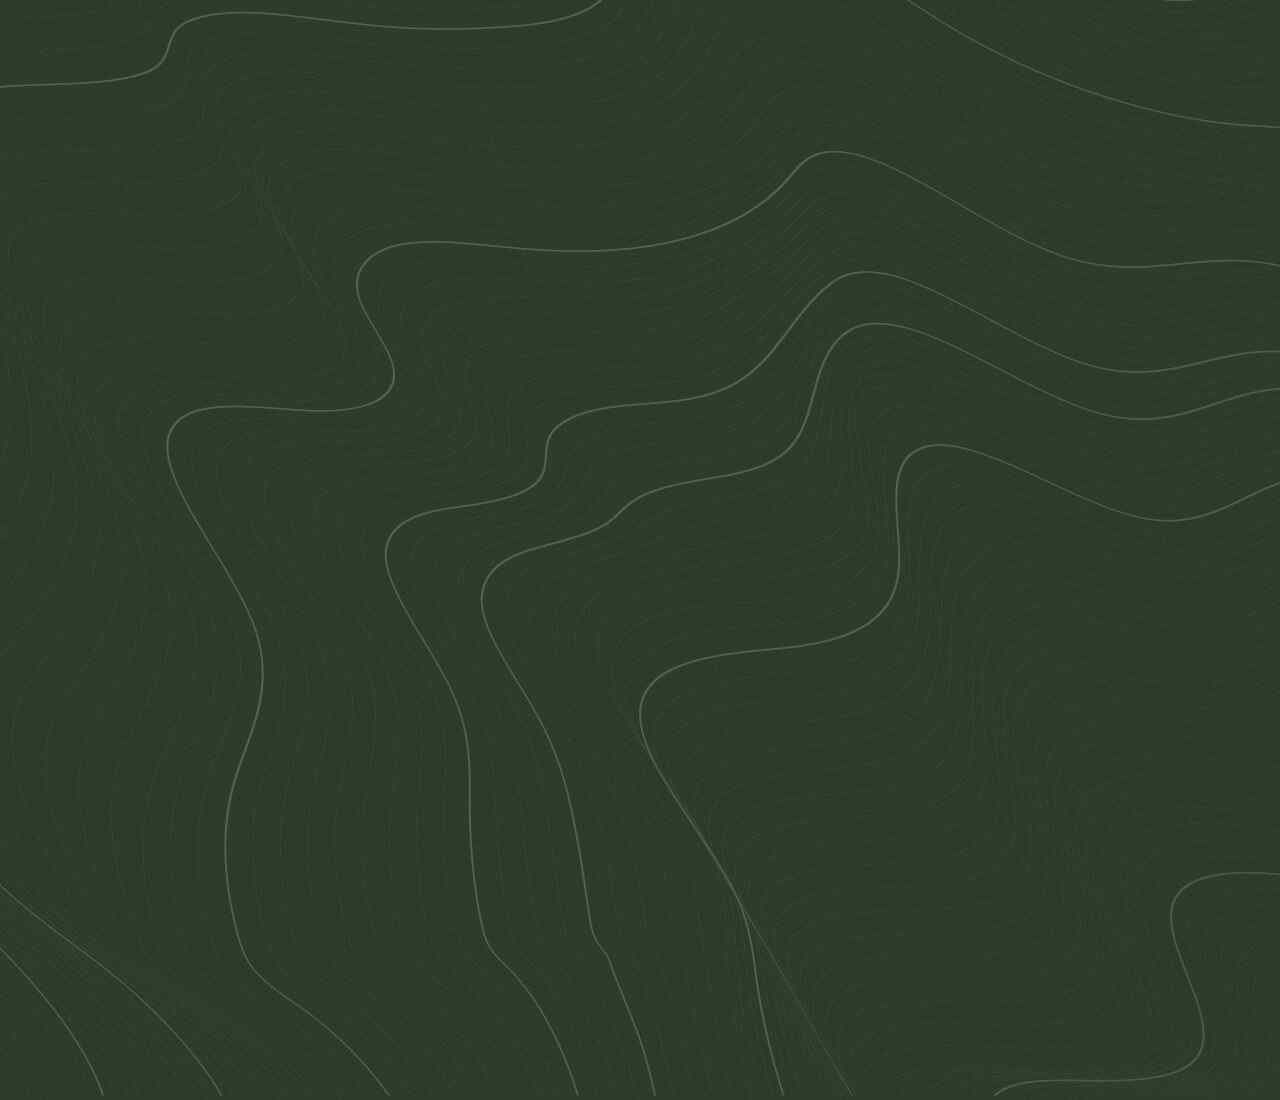 https://www.dvlp.cy/wp-content/uploads/2020/02/green-background-1280x1100.jpg